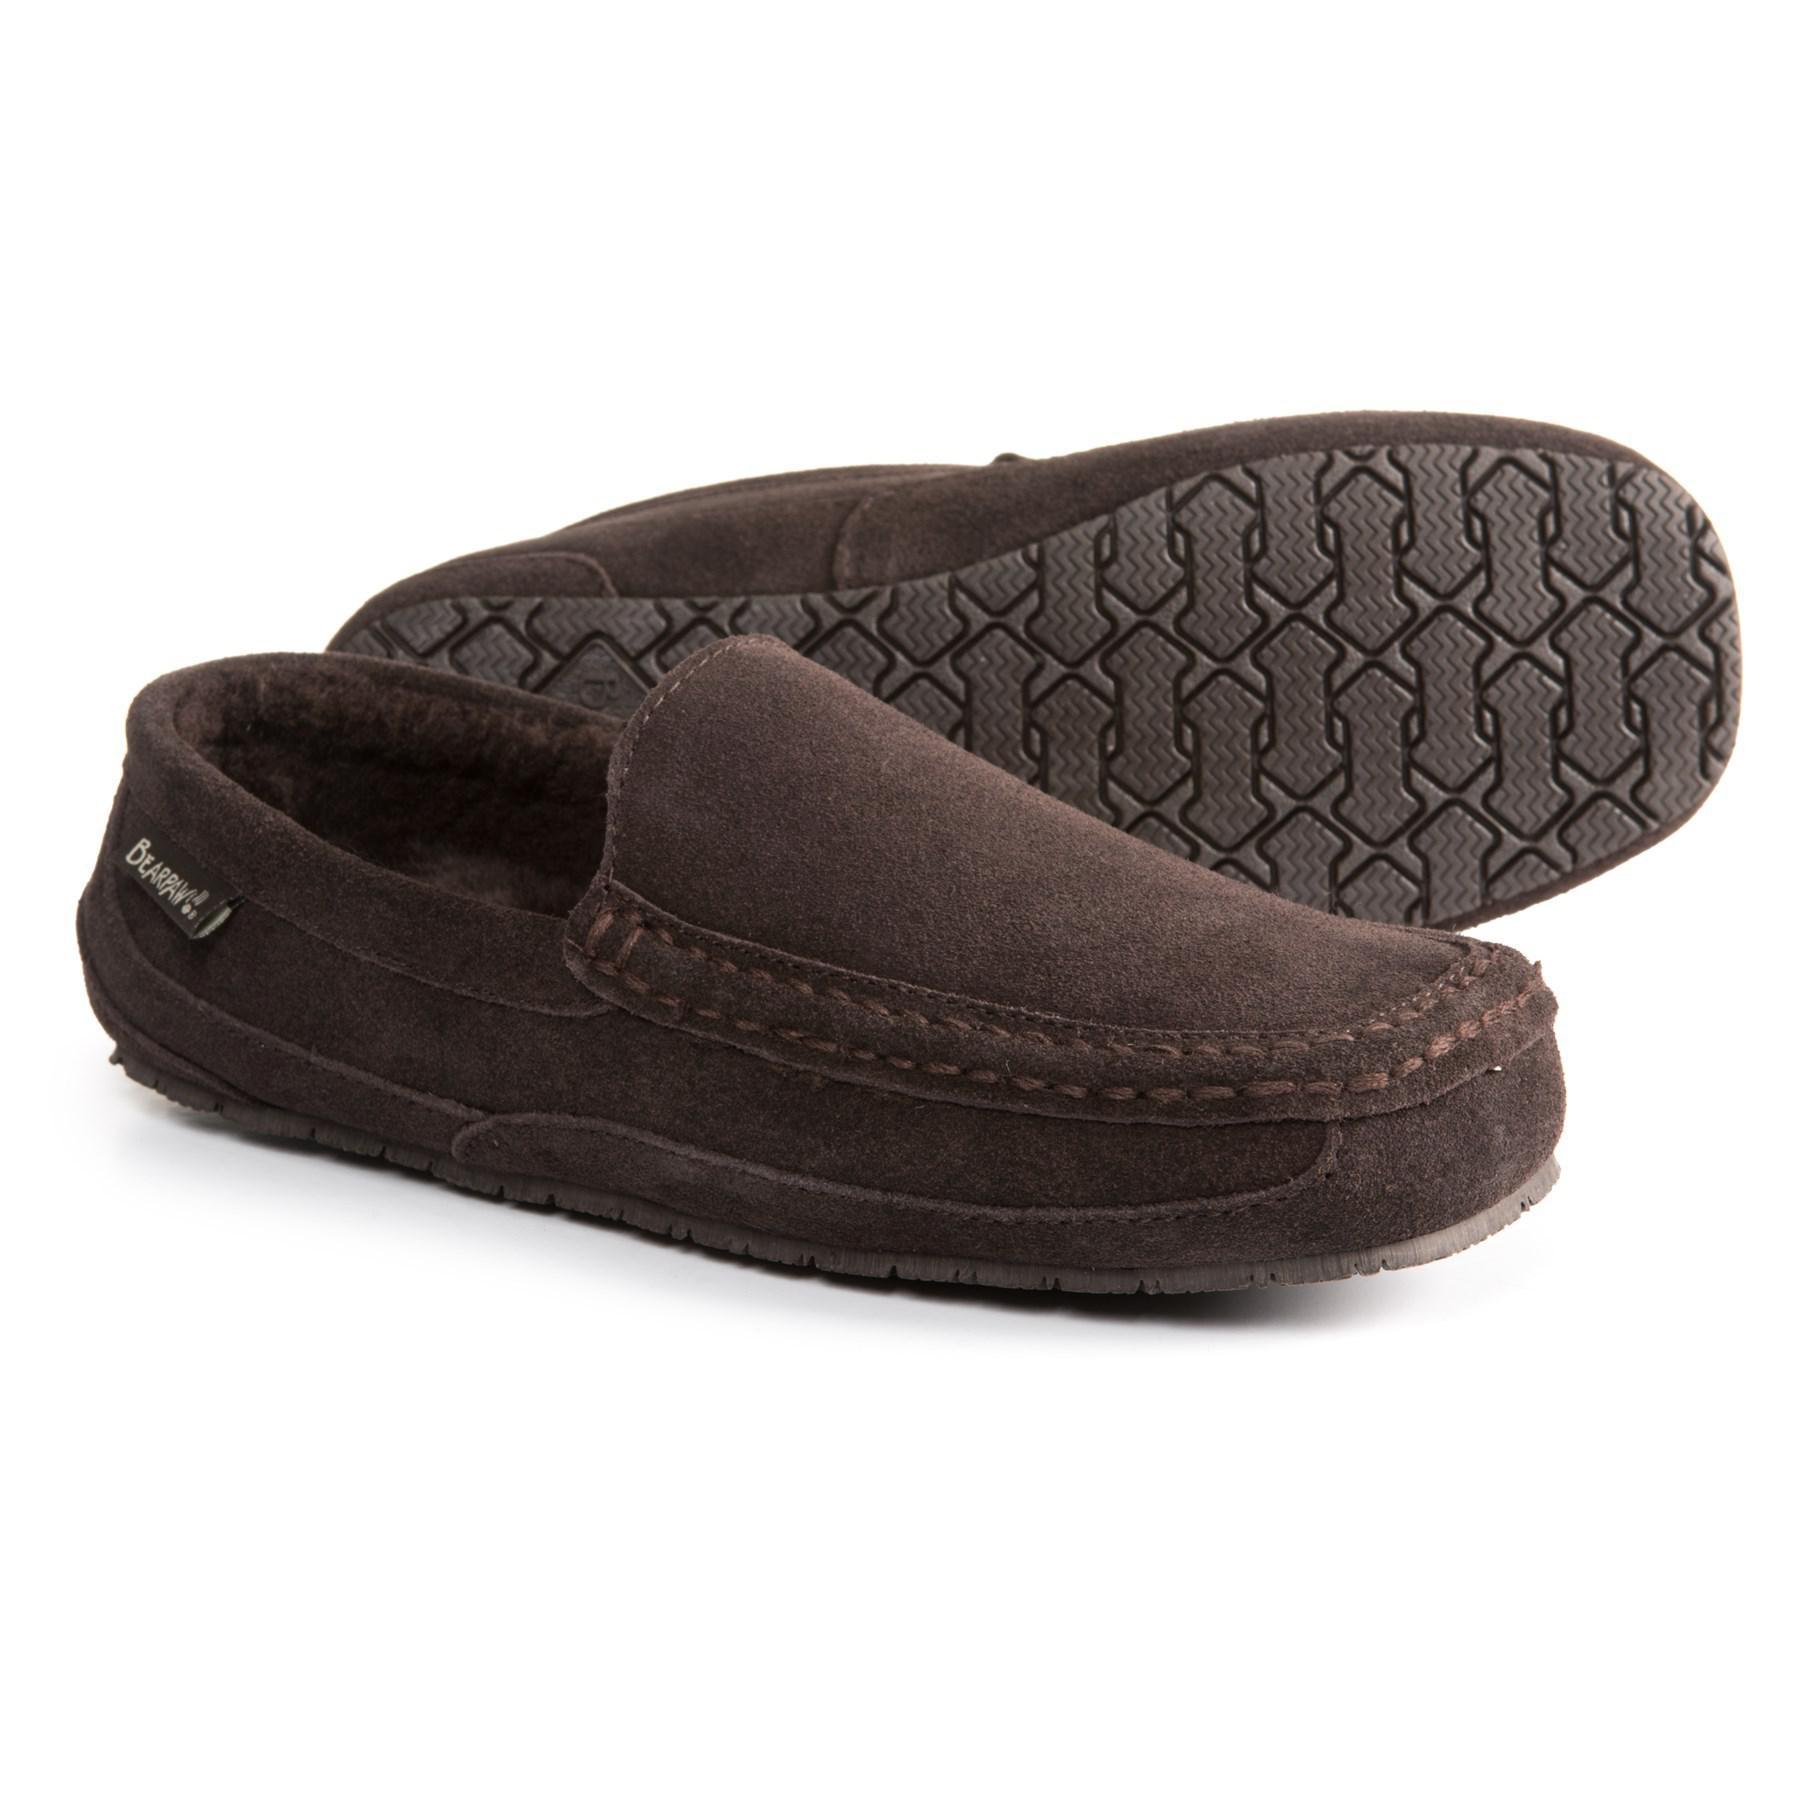 b8ed68434c7 Lyst - Bearpaw Peeta Slippers in Brown for Men